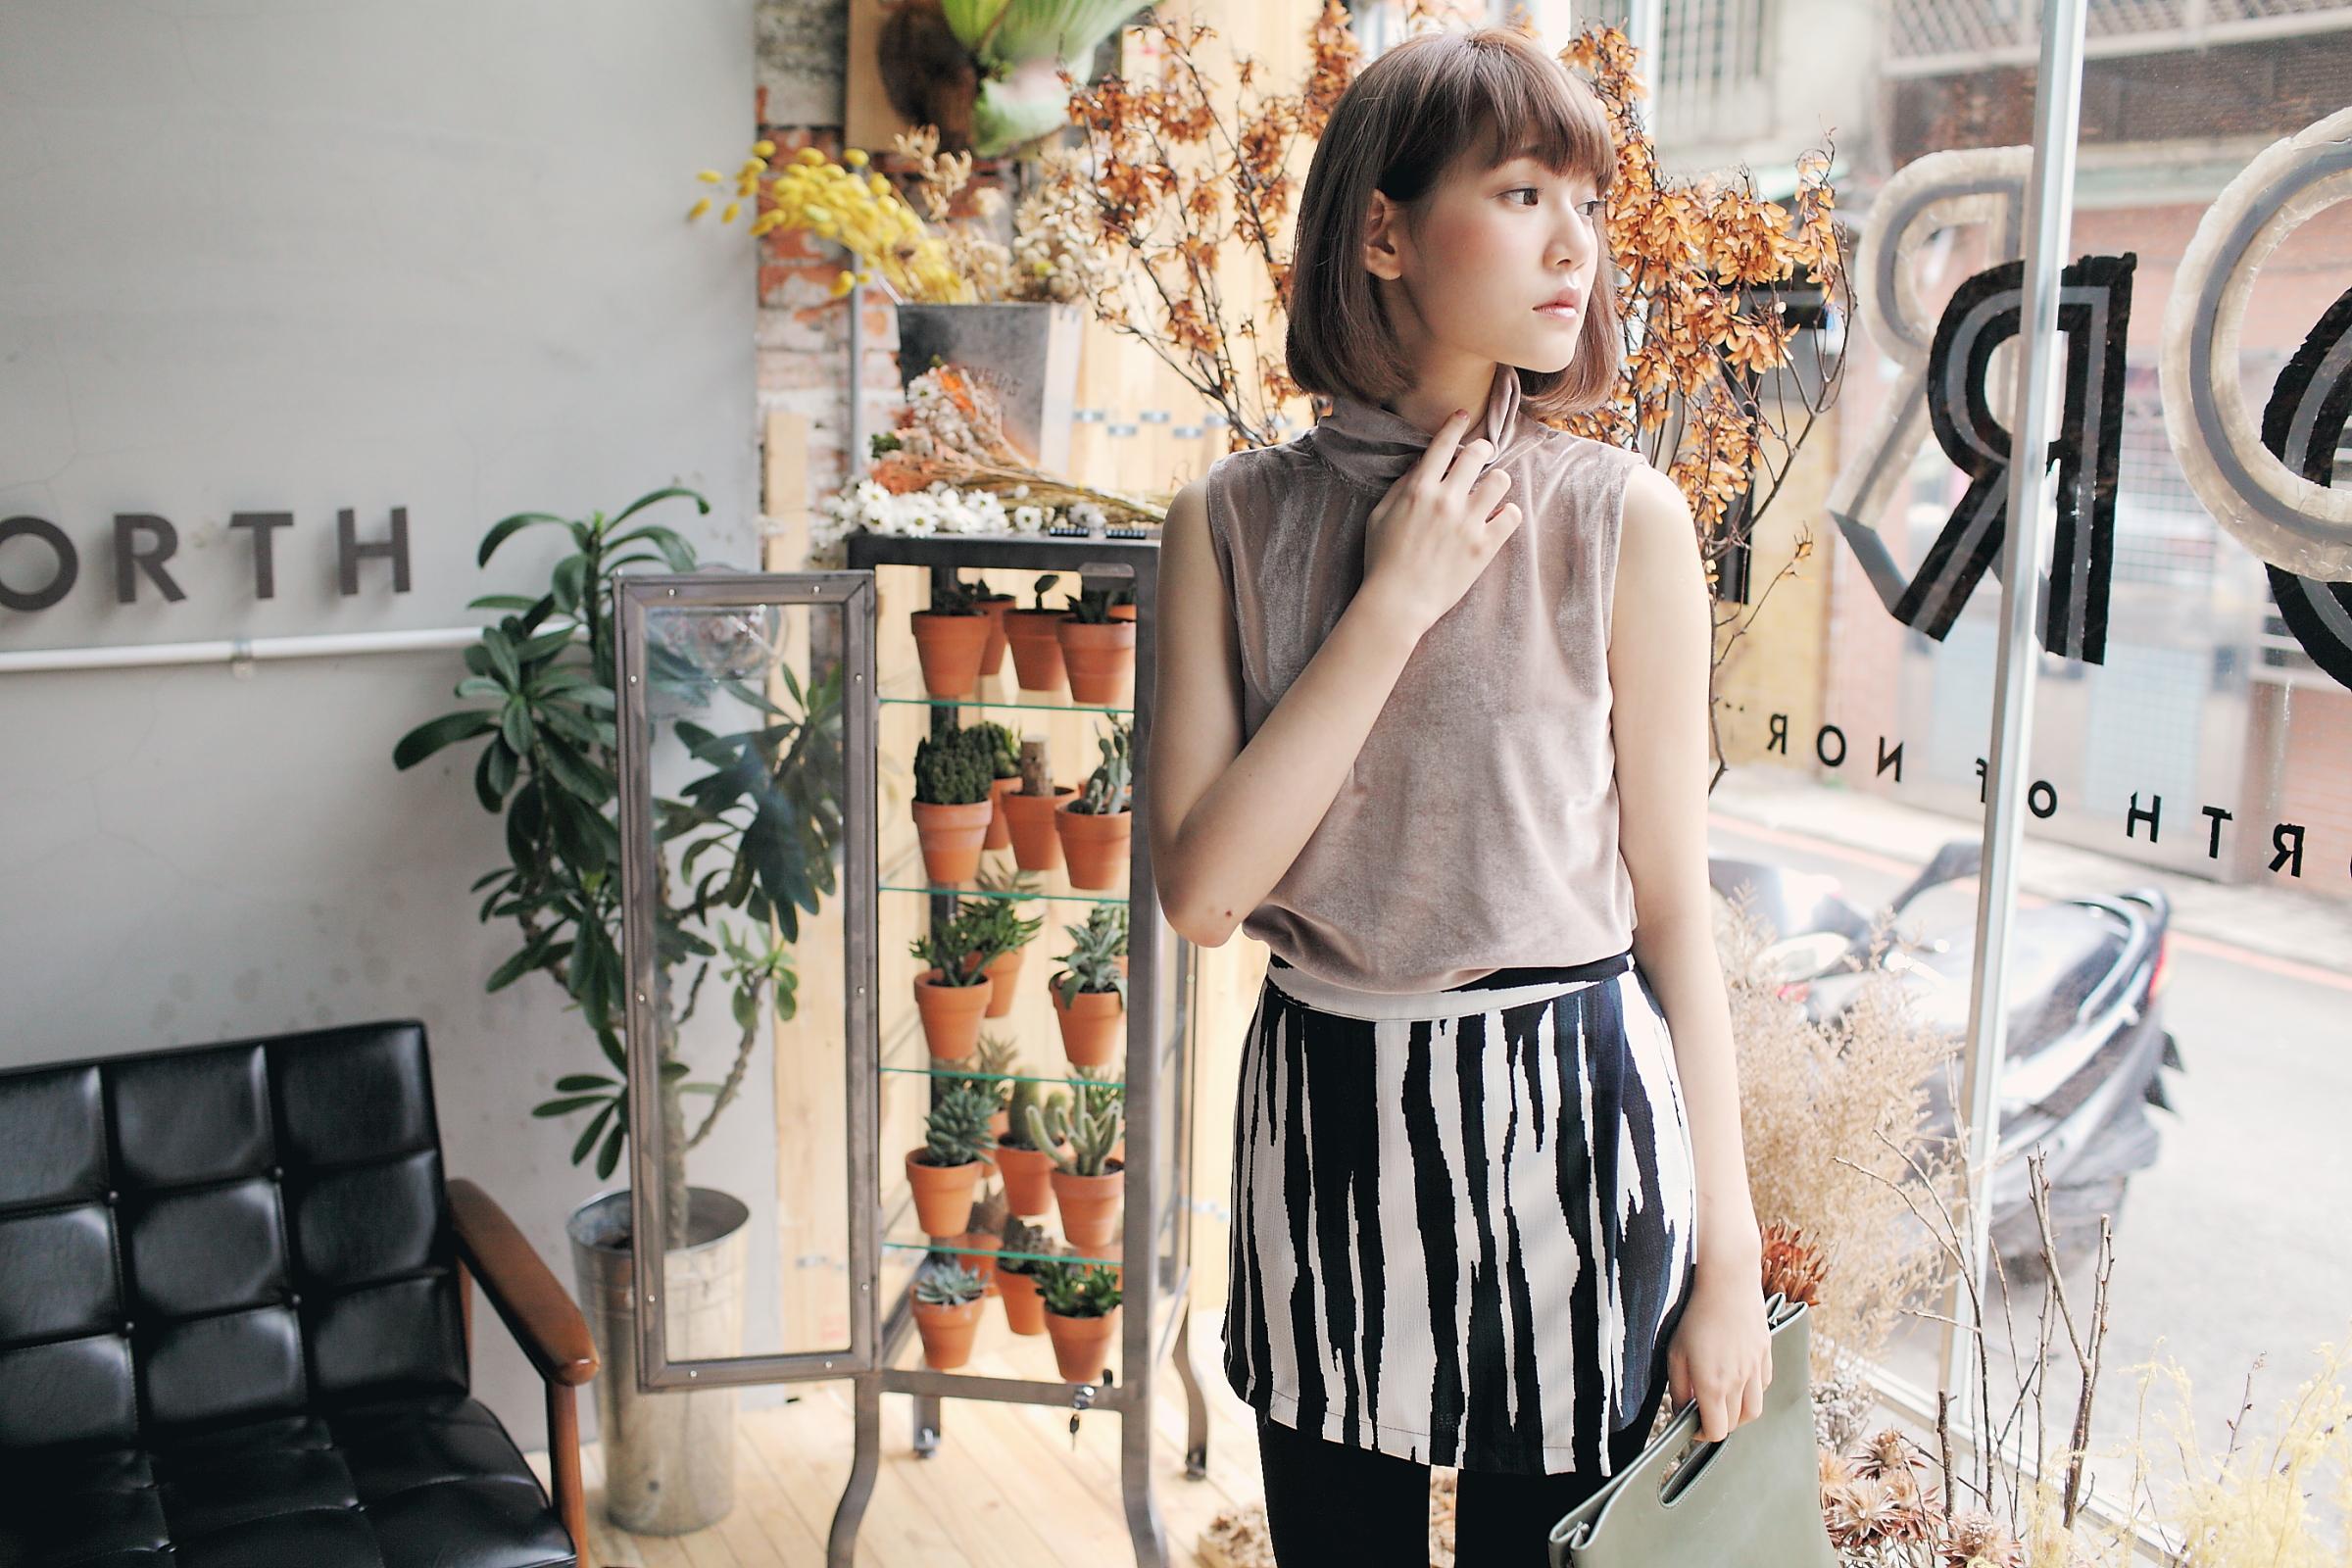 Asian fashion ebay stores 40